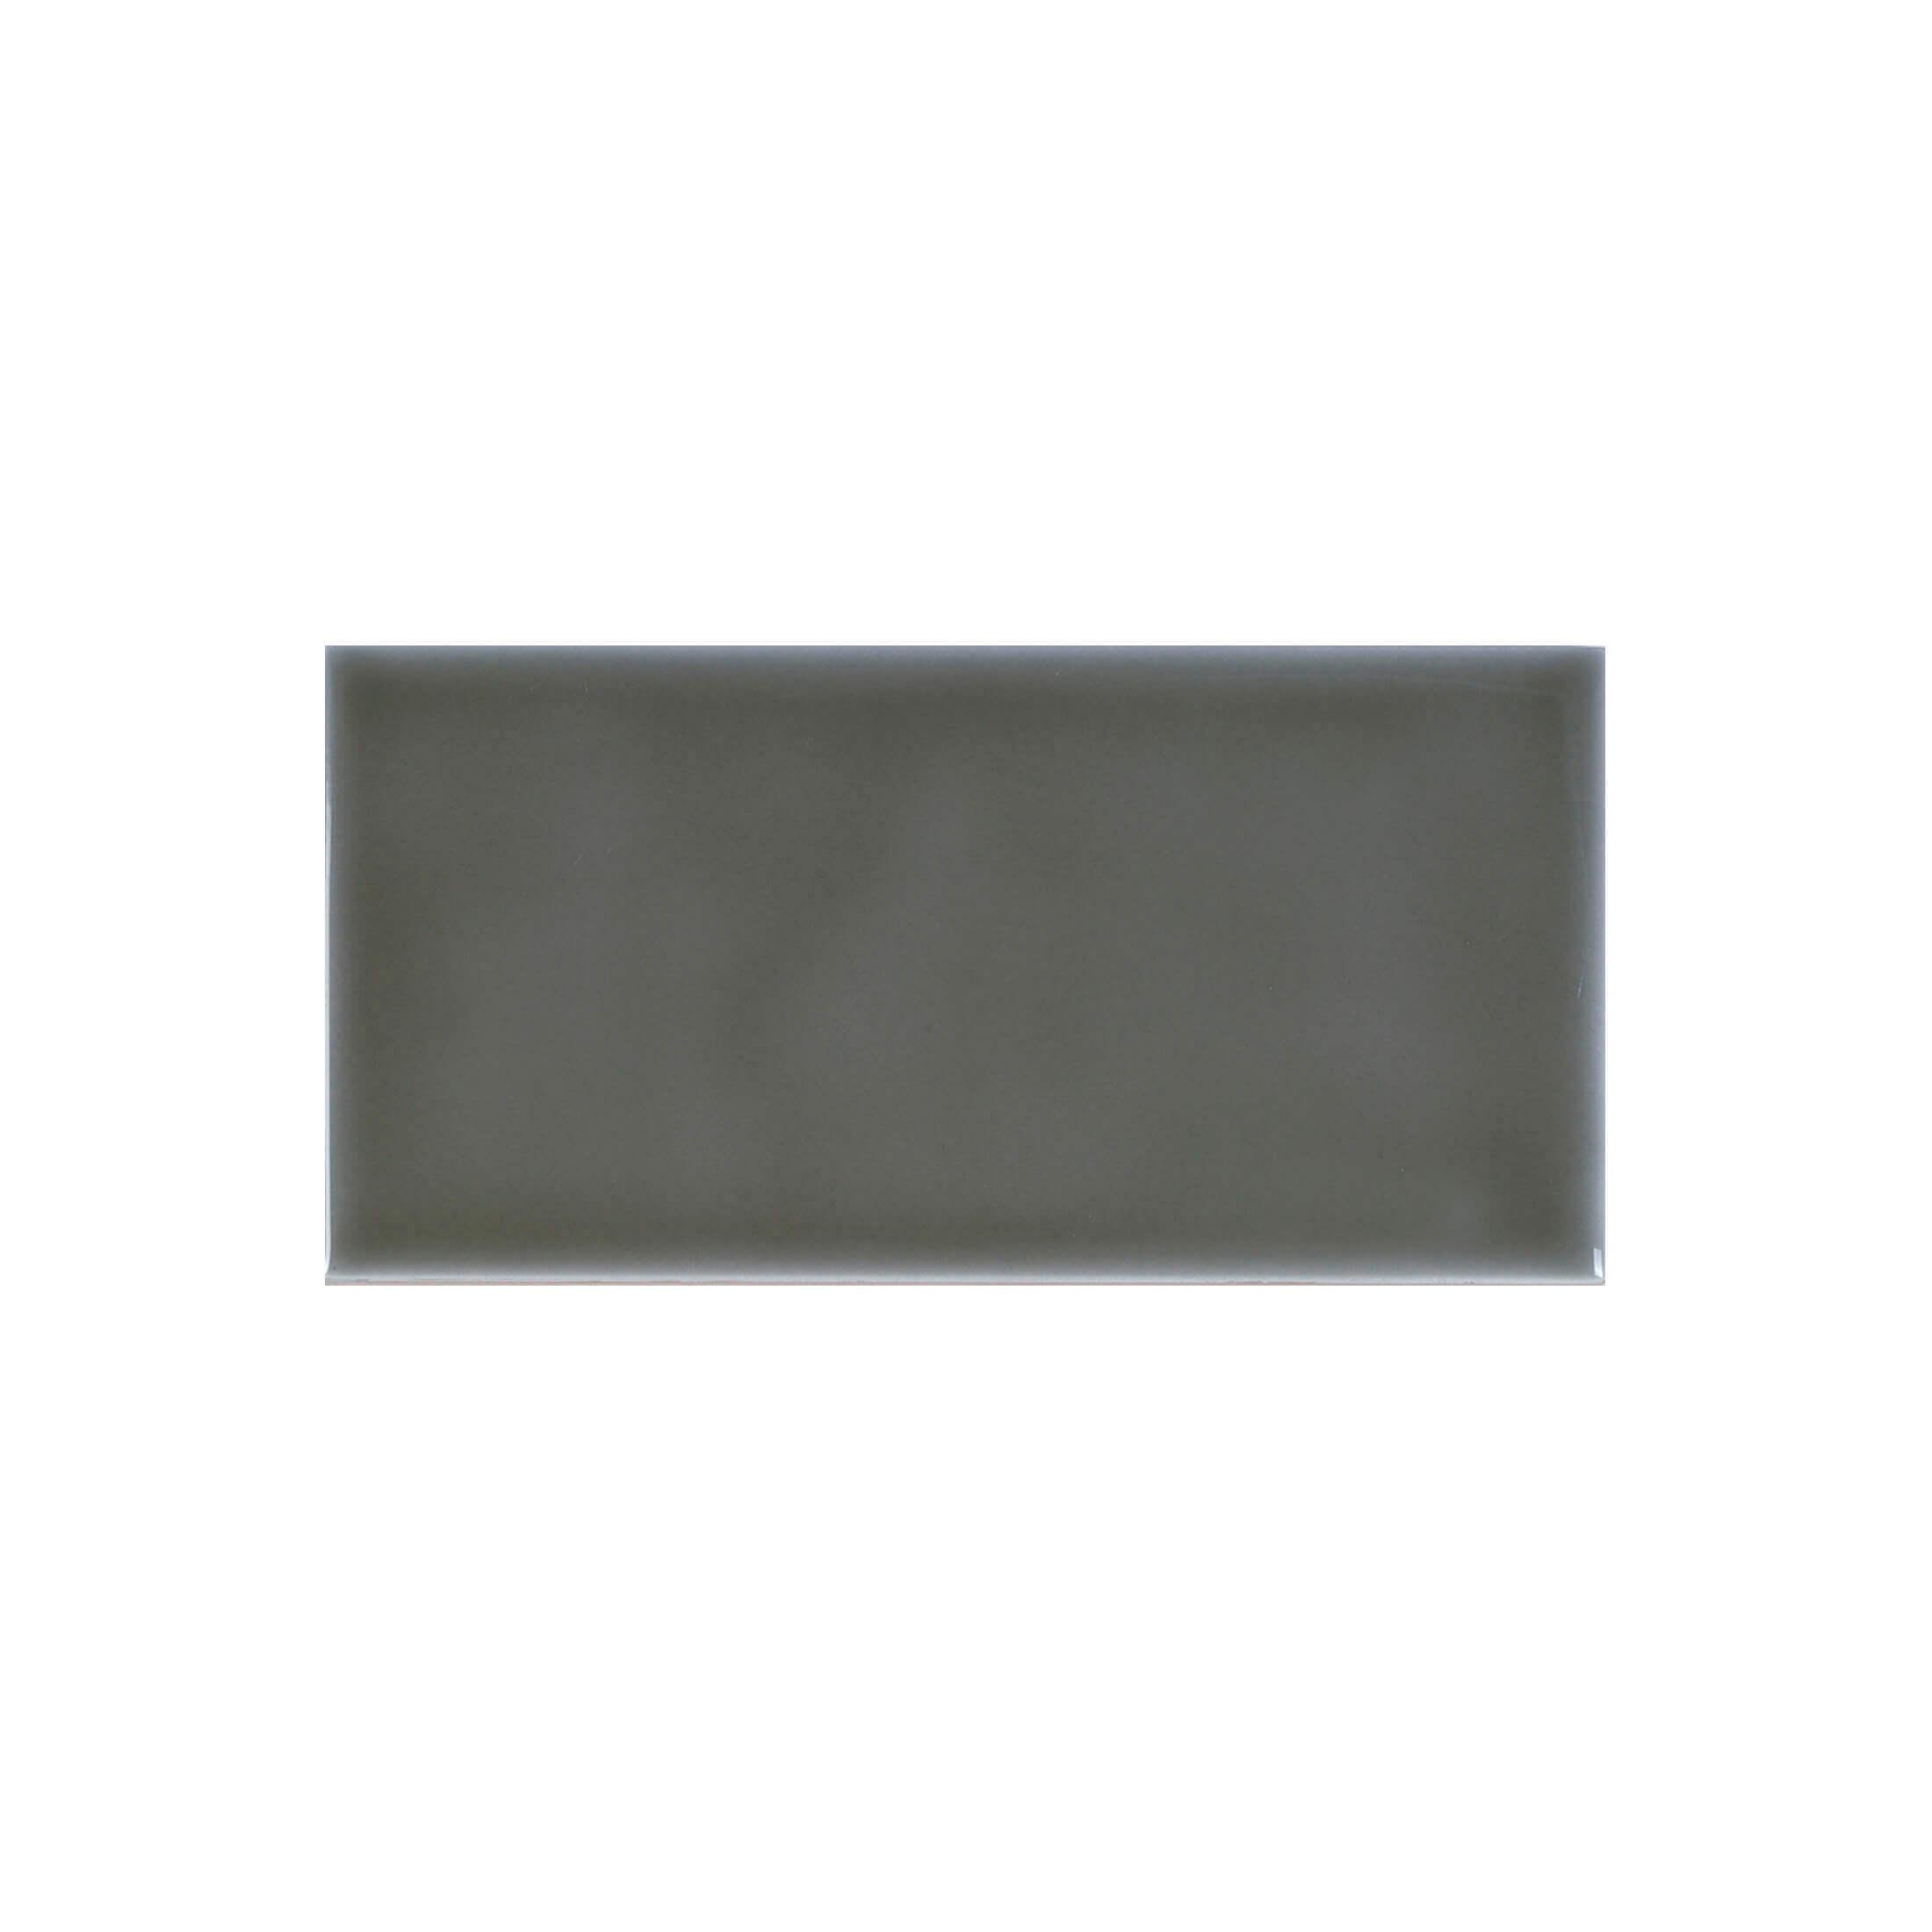 ADST1023 - LISO  - 9.8 cm X 19.8 cm